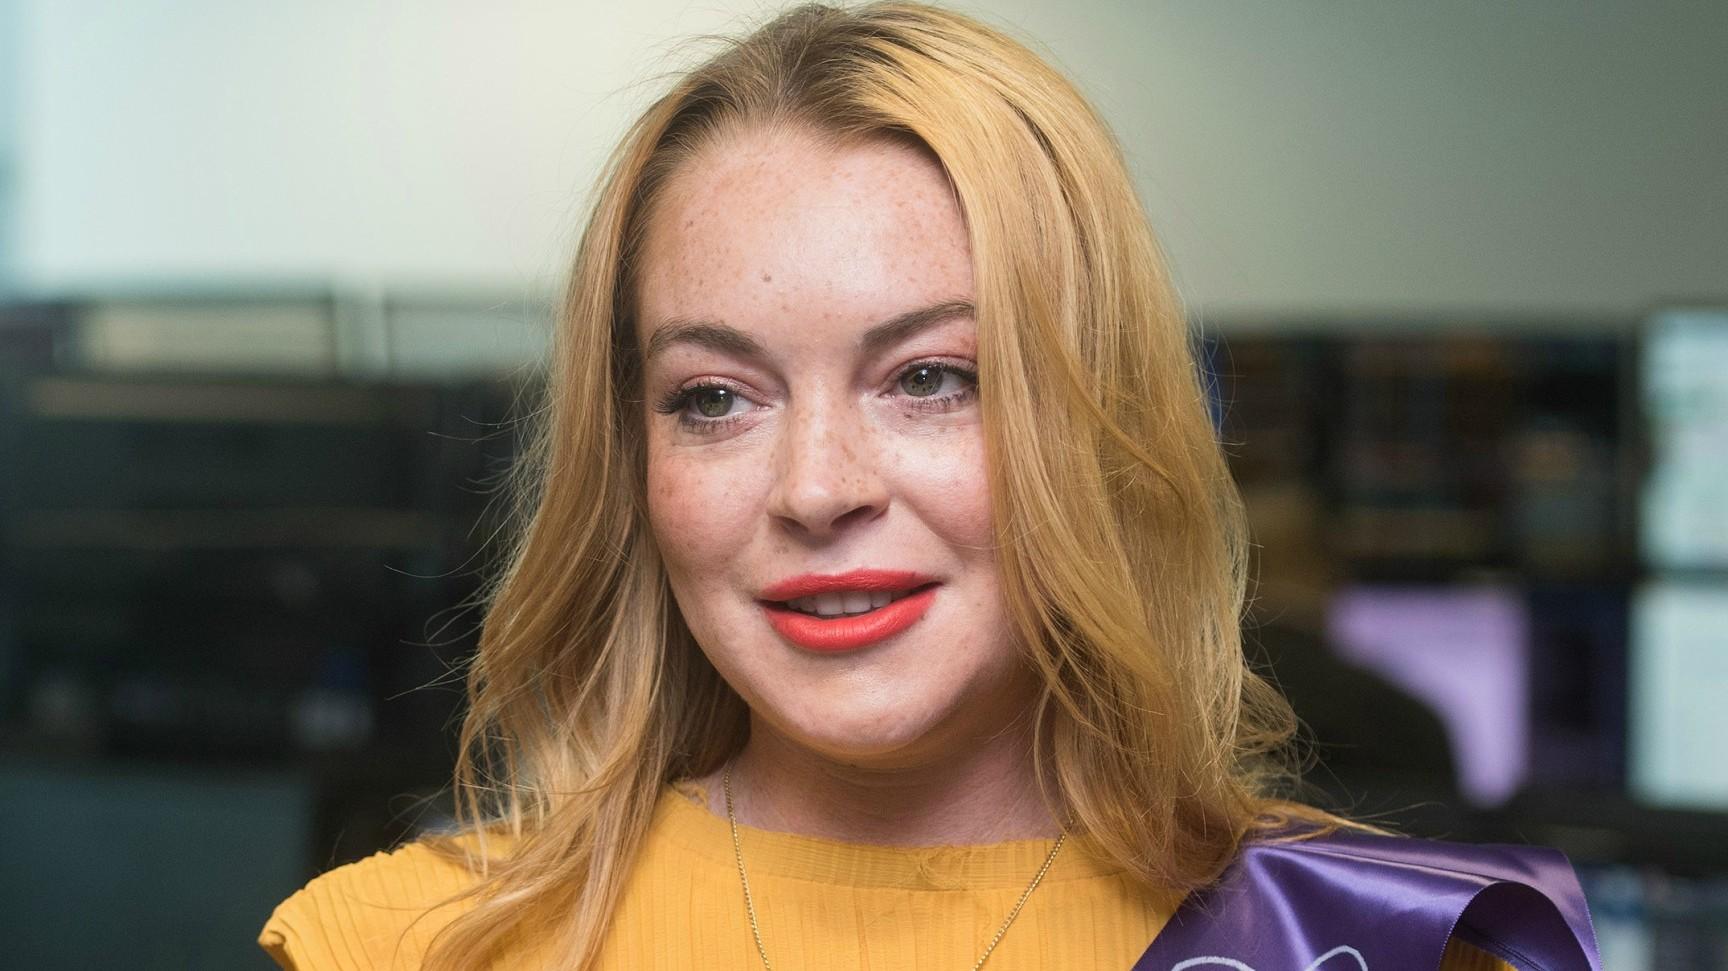 So, is Lindsay Lohan's new accent Turkish? Arabic? Irish